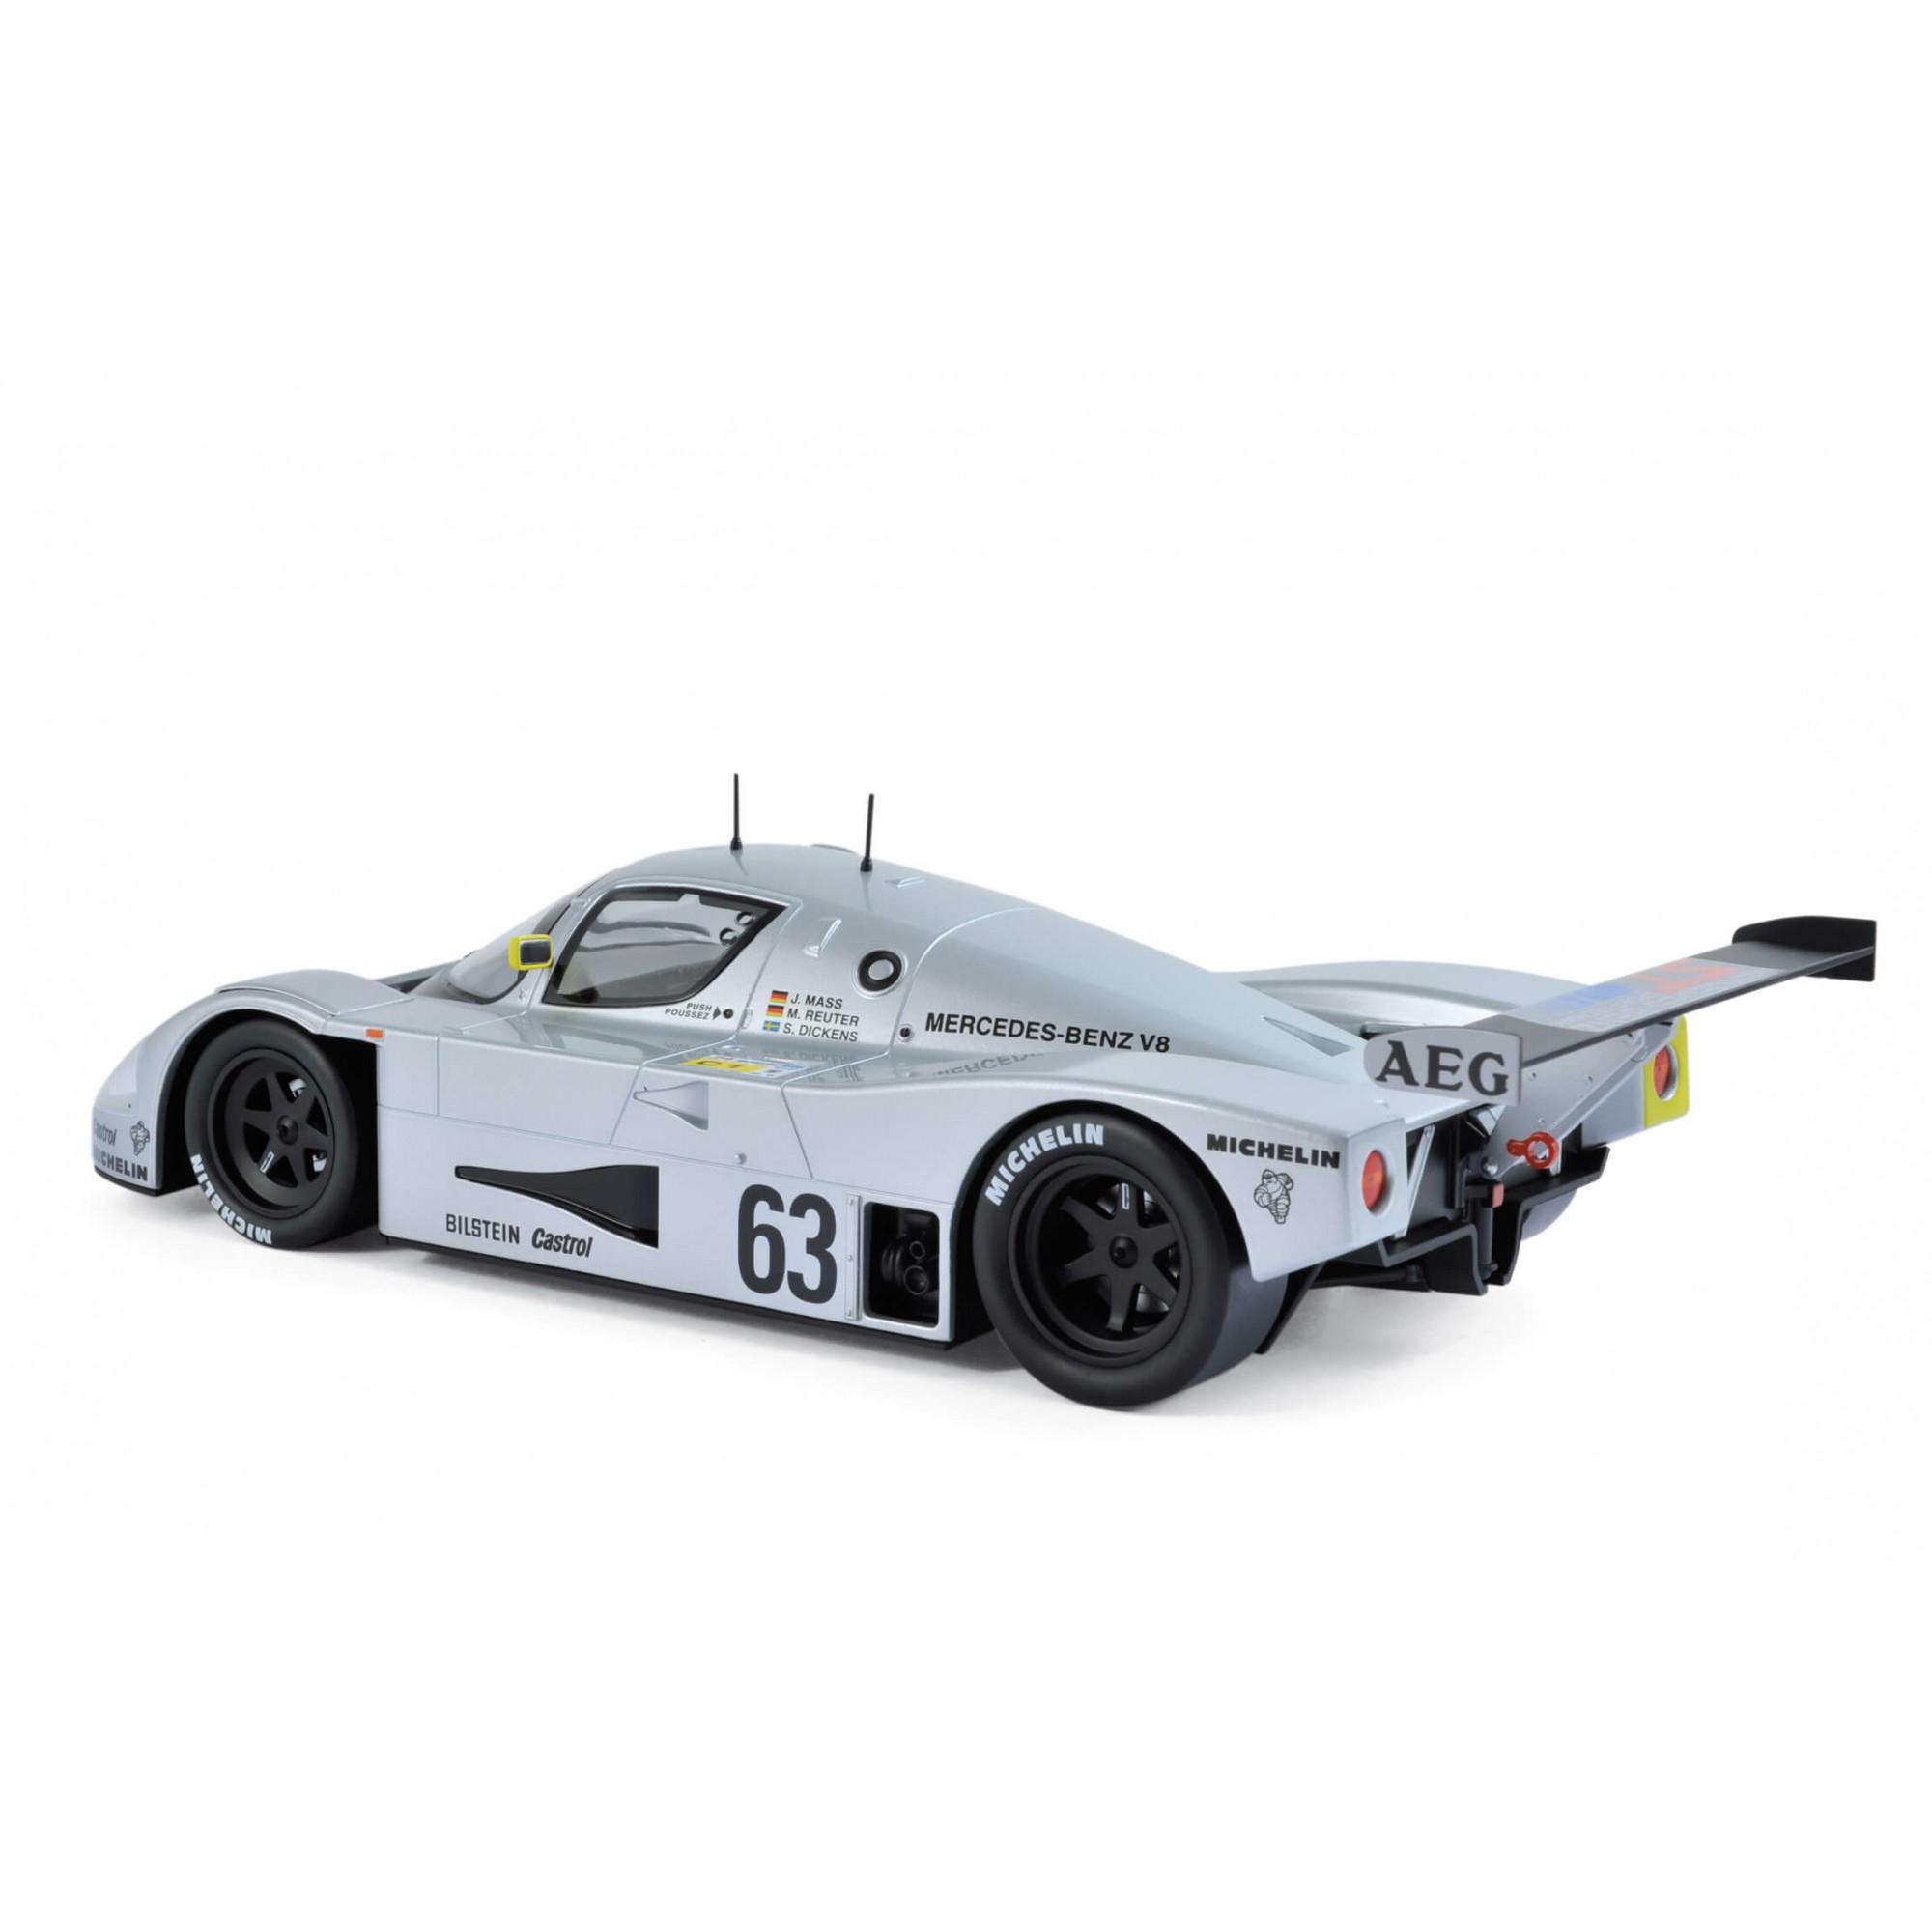 Miniatura Sauber-Mercedes C9 #63 (1989) Winner France 24h 1/18 Norev